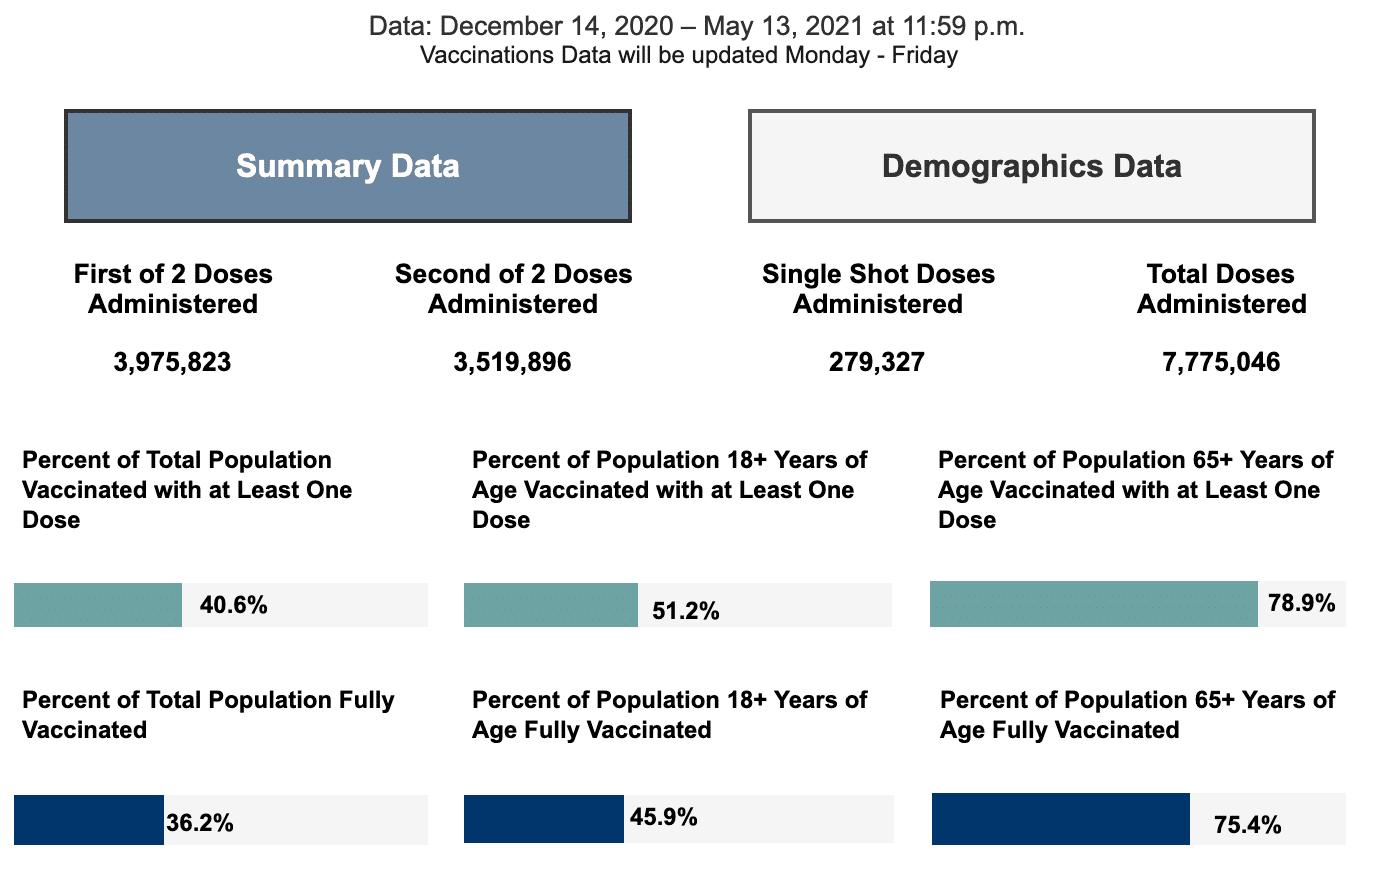 Friday May 14, 2021 - Appalachian State, Watauga, Alleghany, Ashe COVID-19 Cases & Vaccine Data